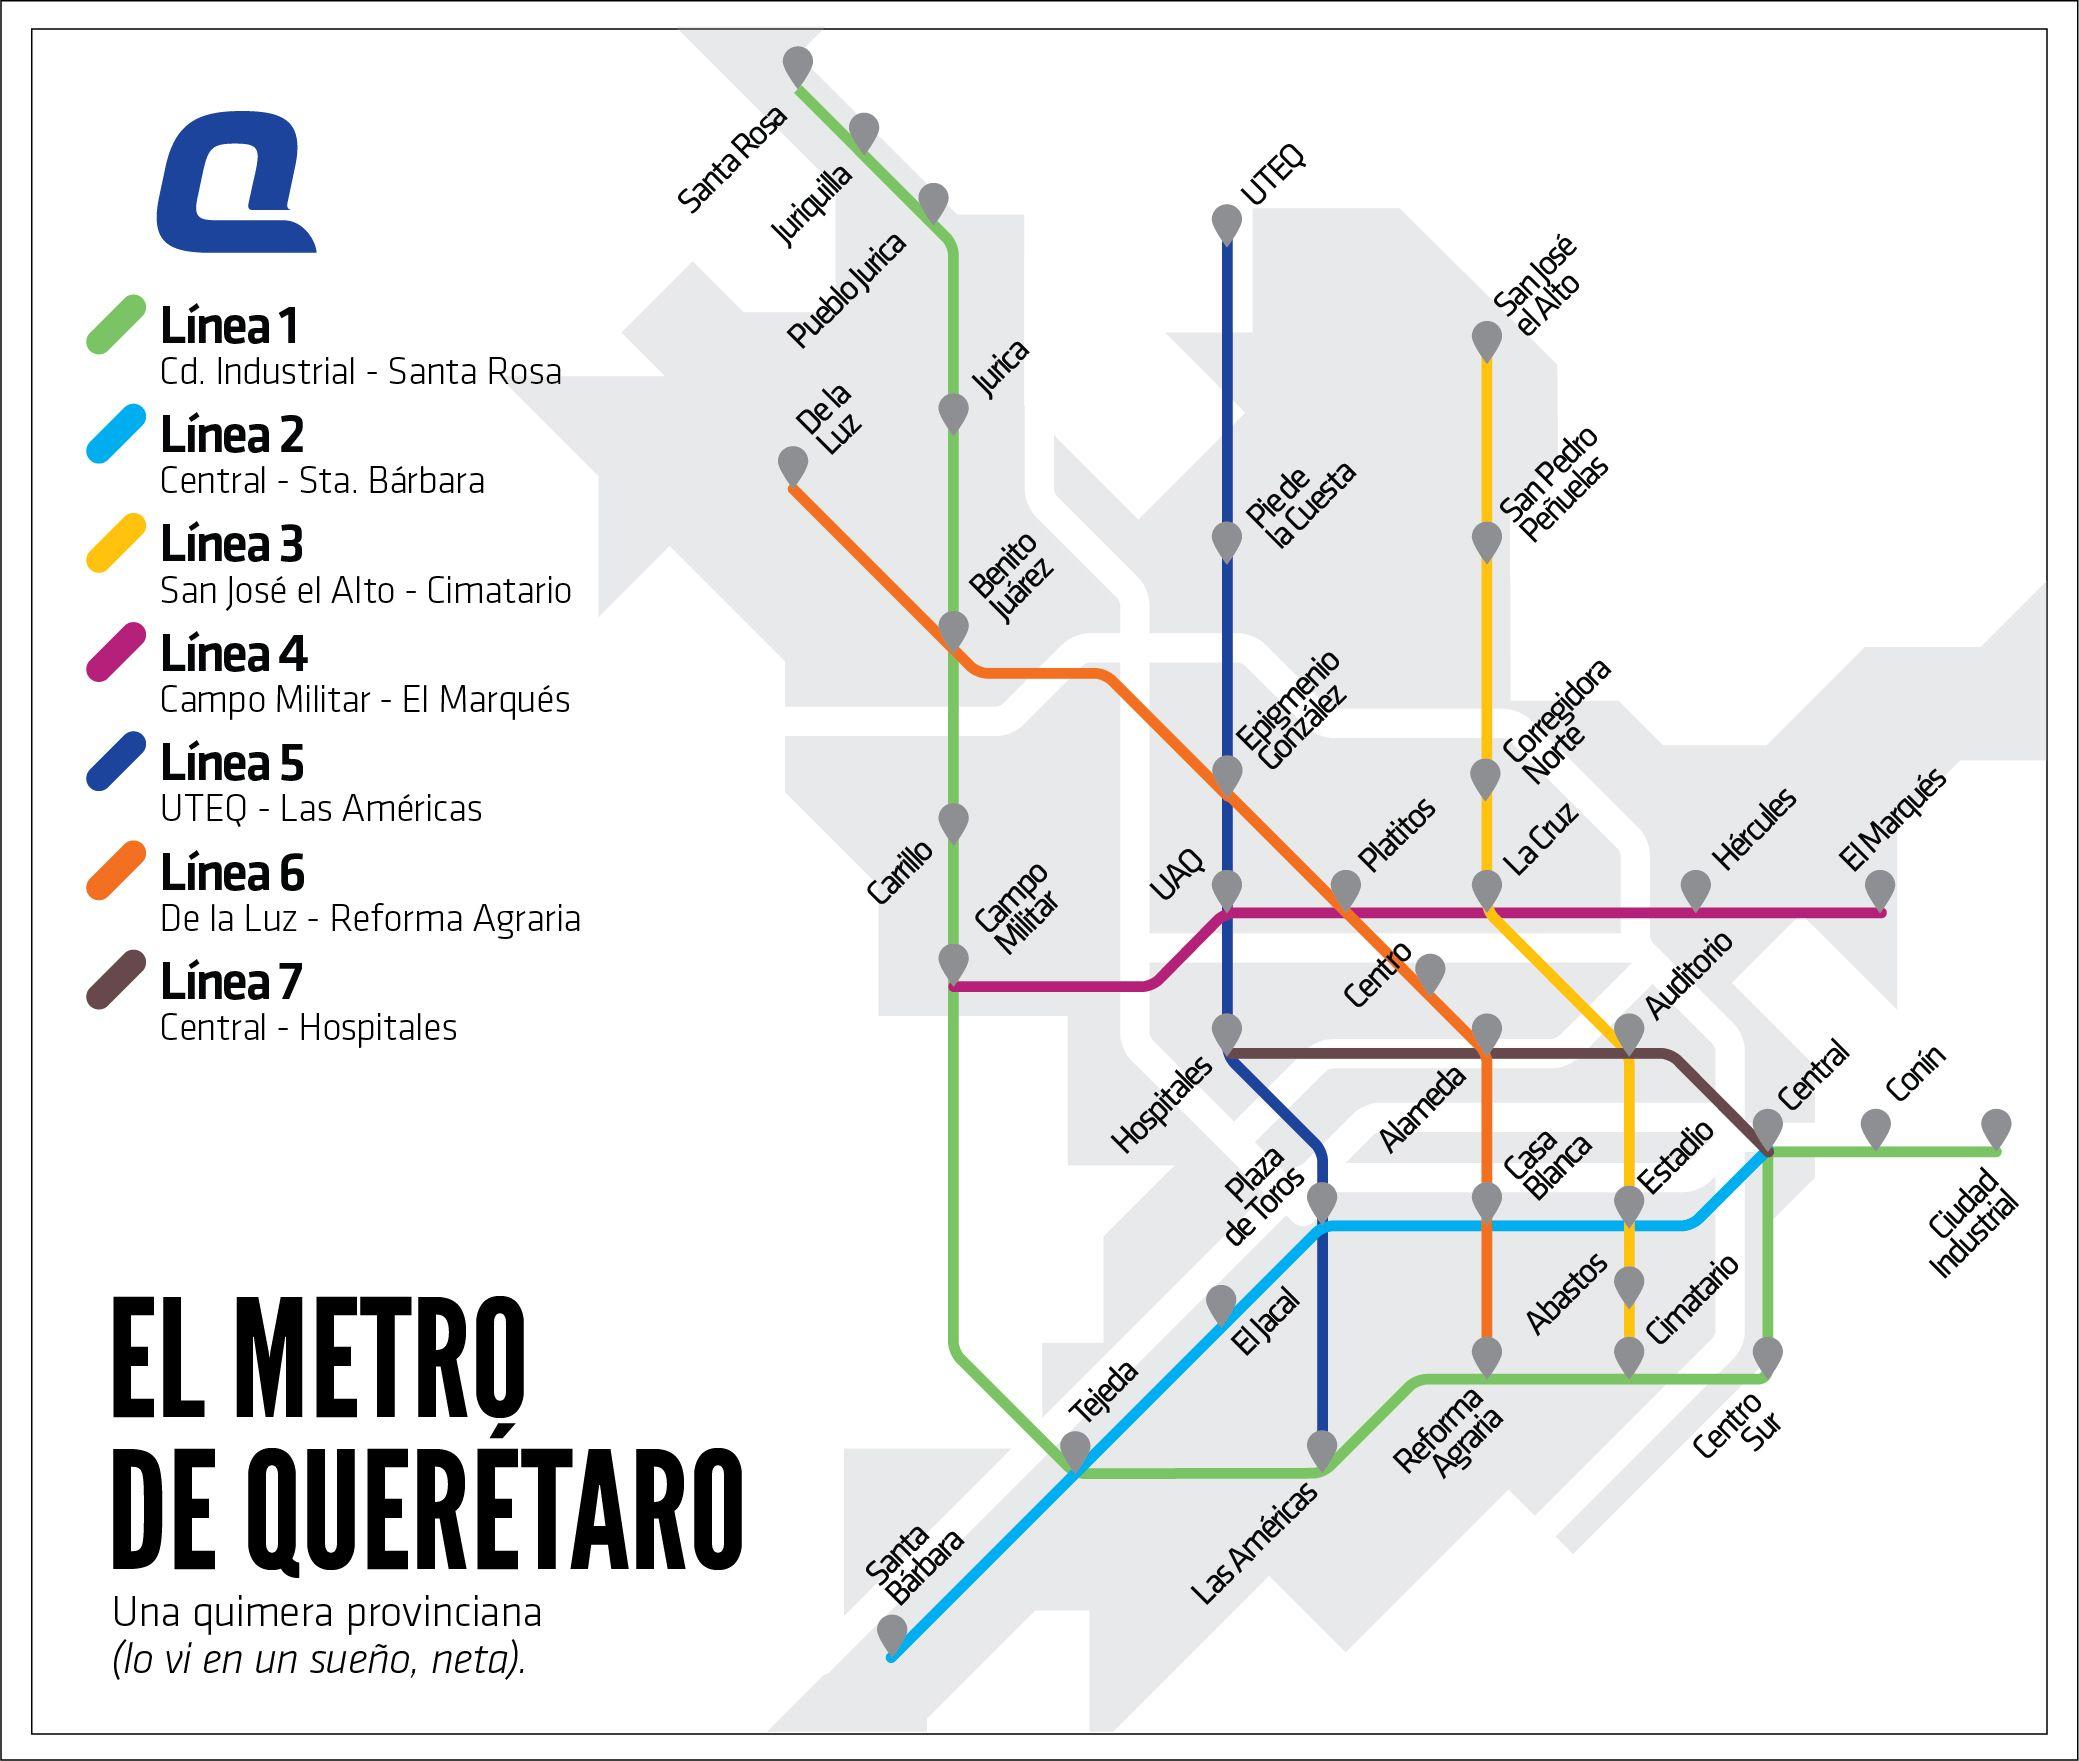 Resultado de imagen para Querétaro mapa metro